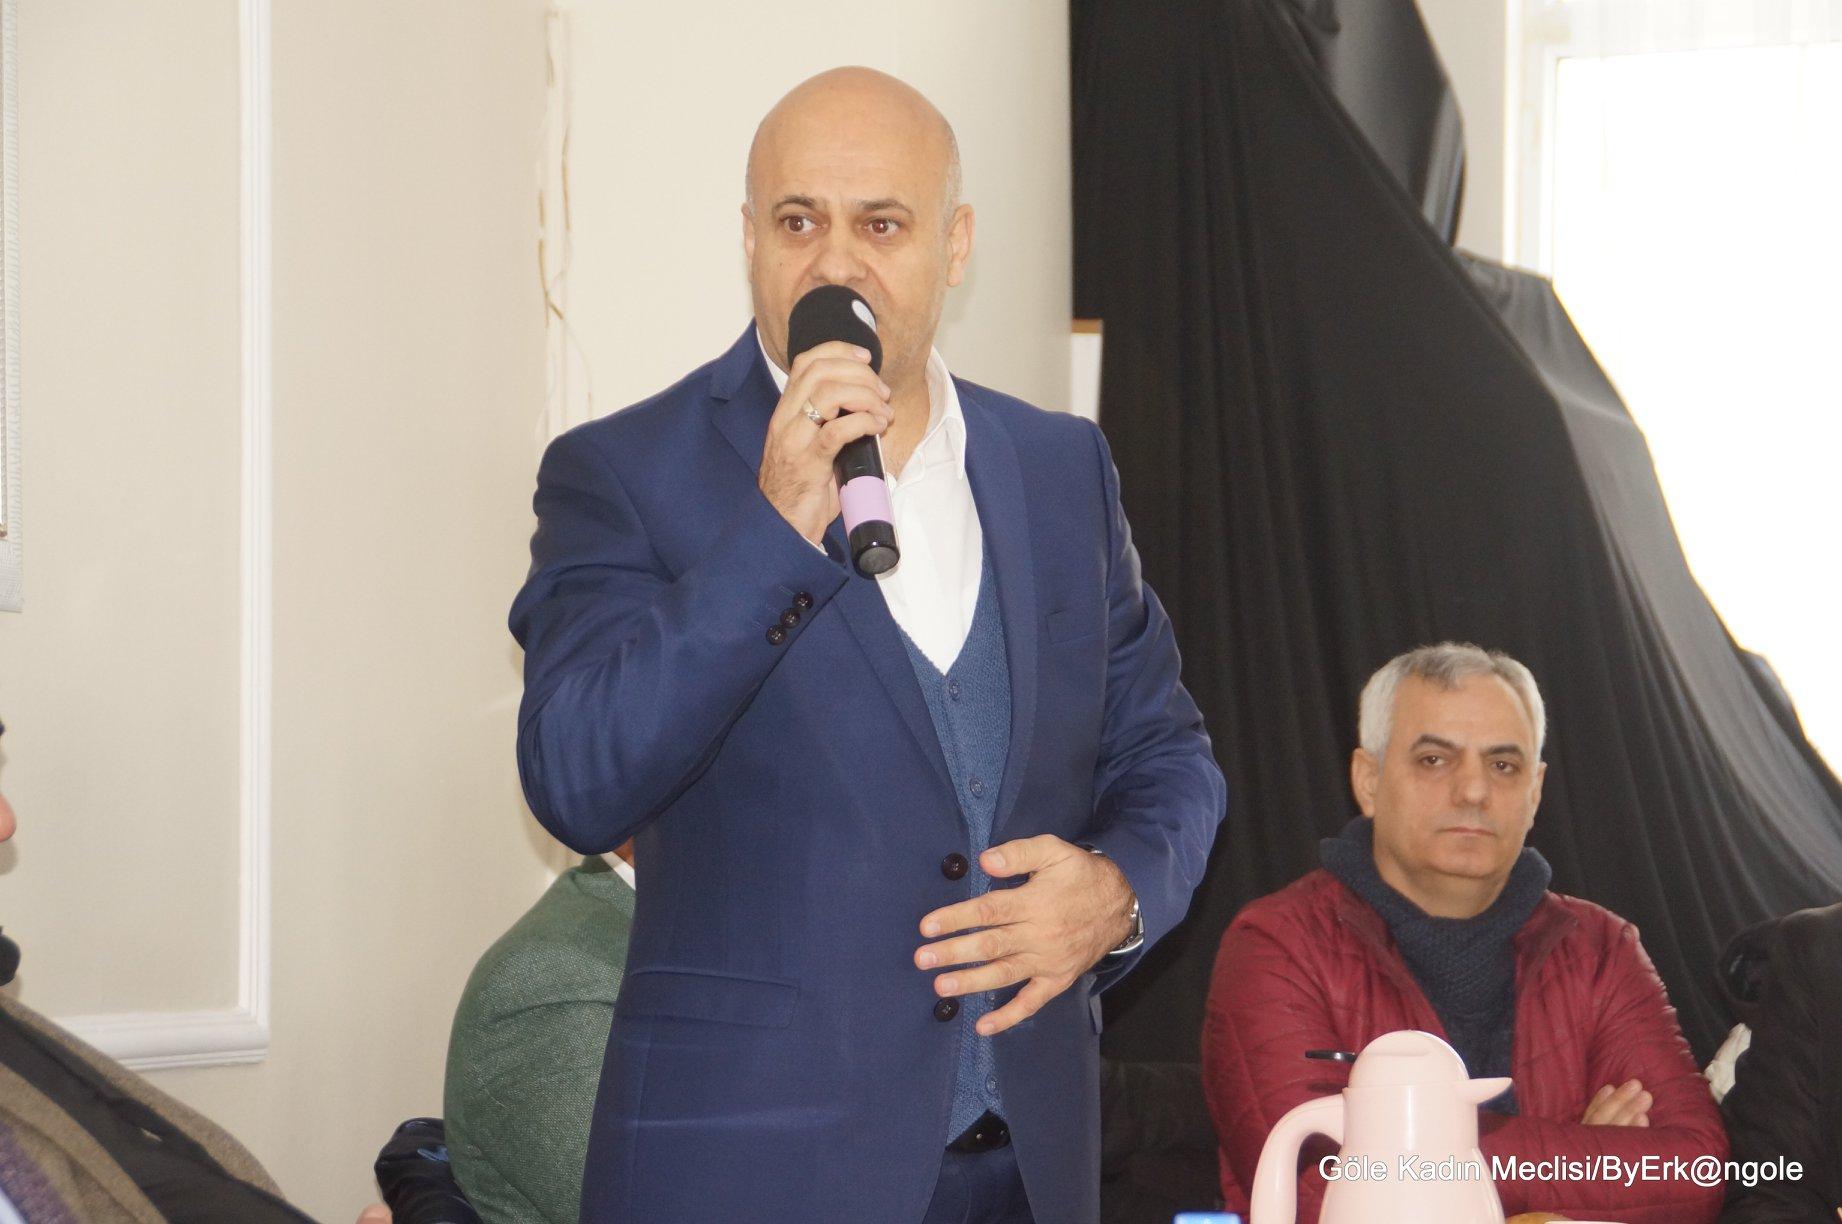 'LAFI EVELEME GEVELEME GEREKENİ YAP BOZKURT'